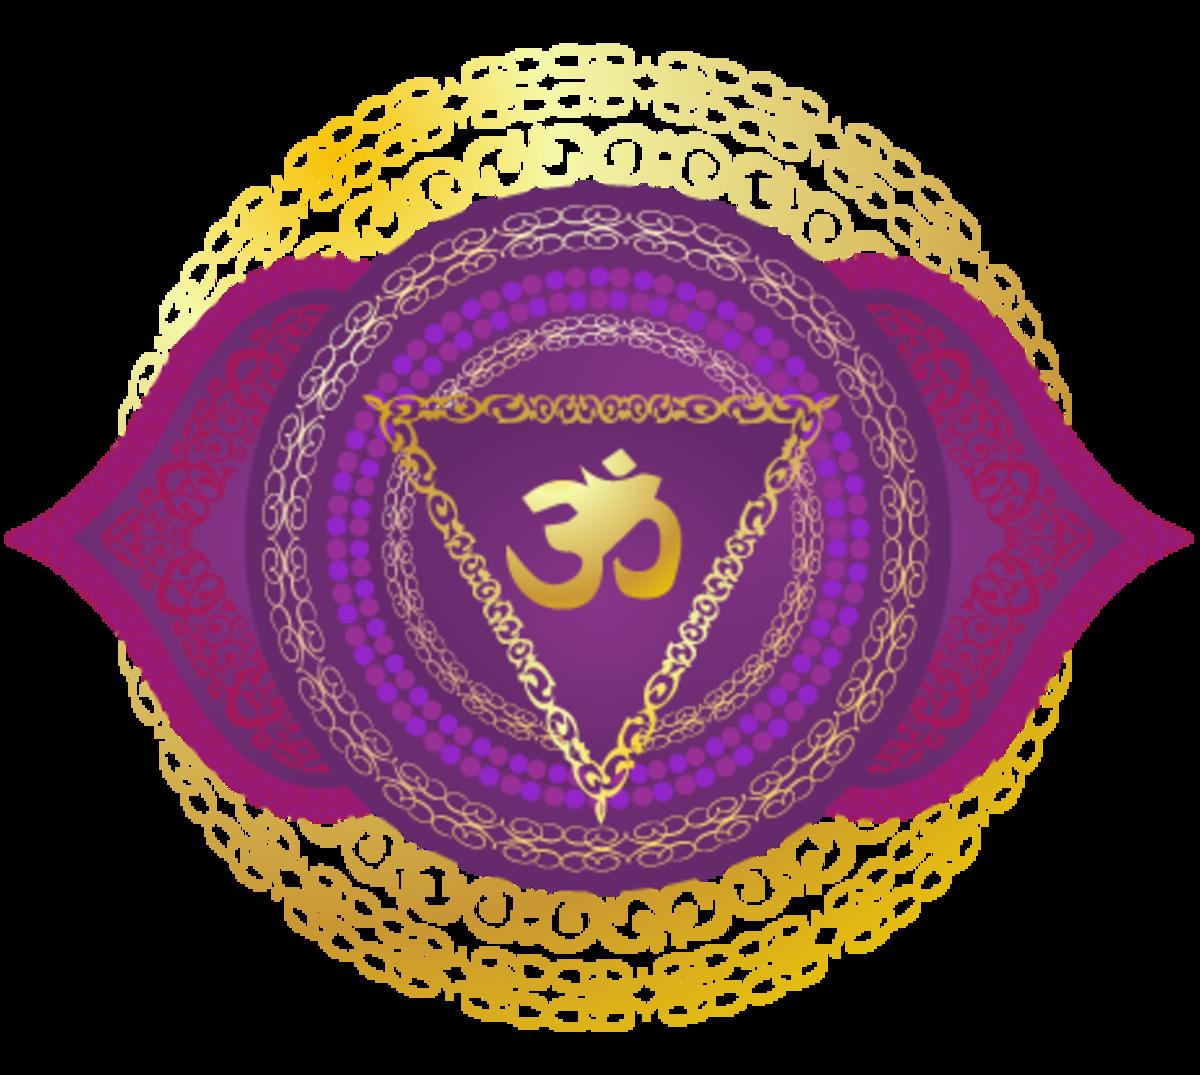 Traditional symbolic representation of Ajna chakra